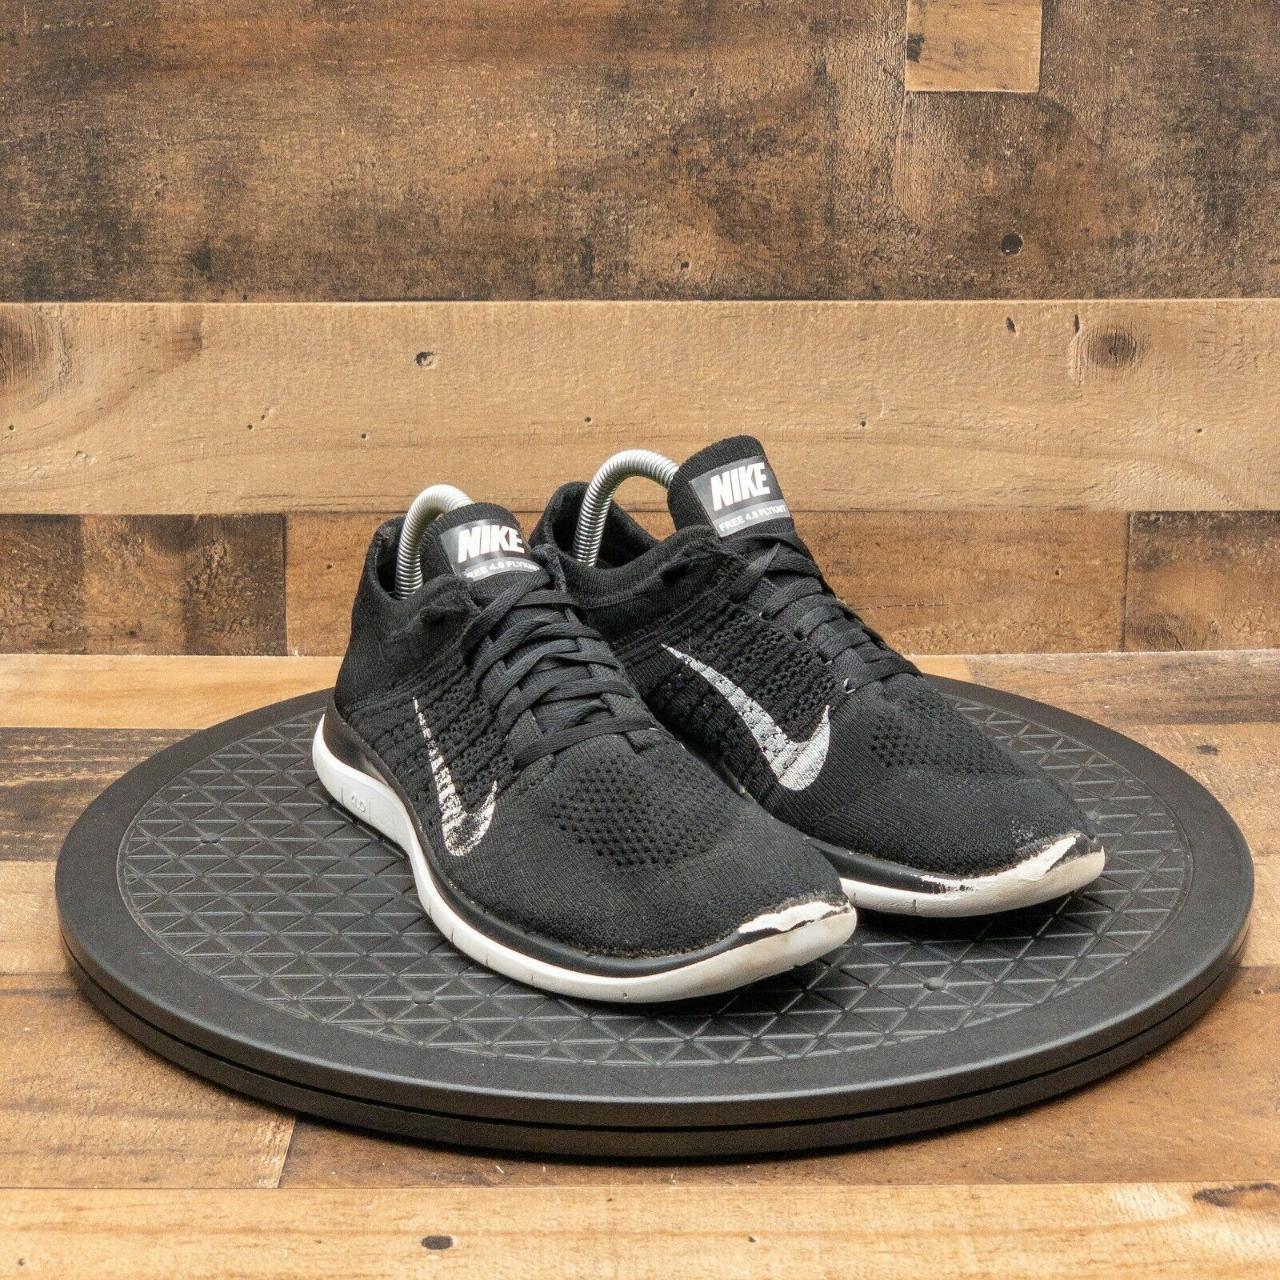 Product Image 1 - Nike Free 4.0 Flyknit Women's